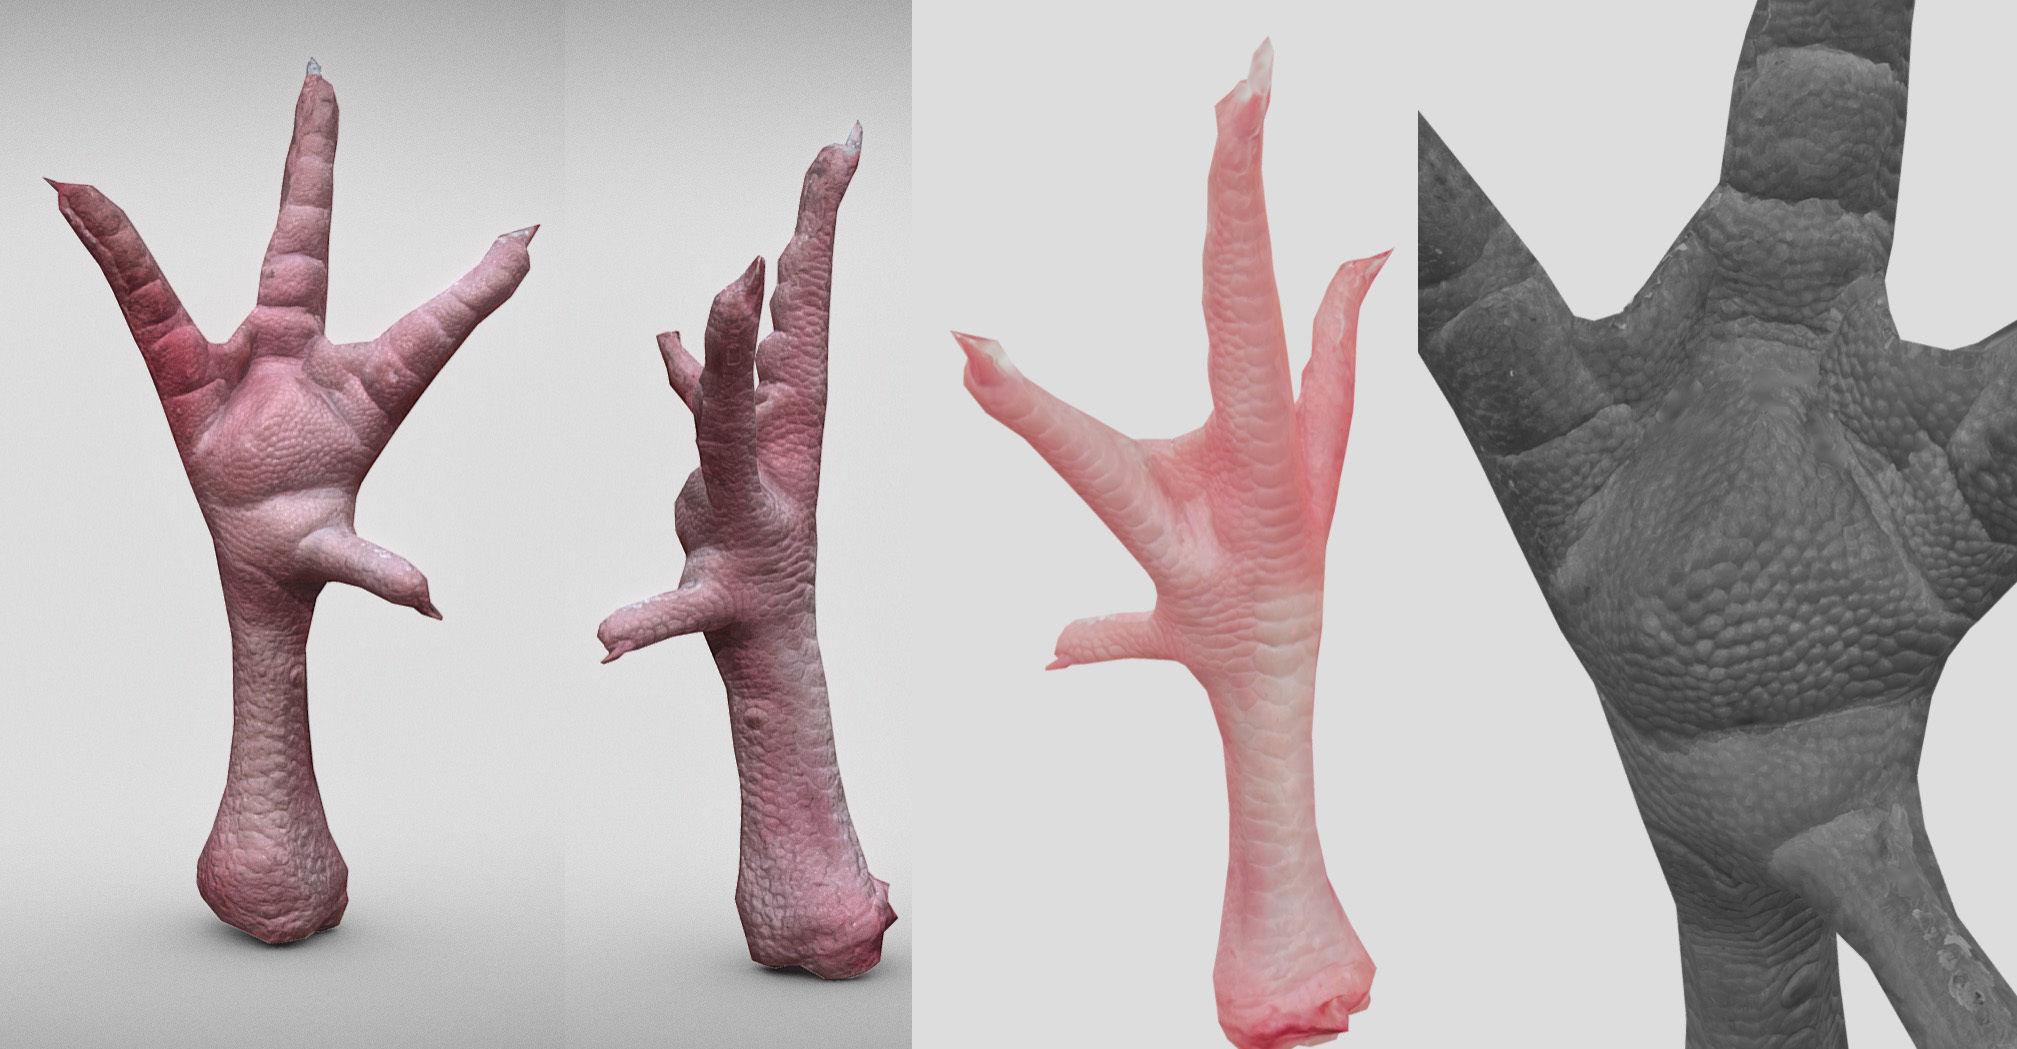 Raw Chicken feet 3dscan model